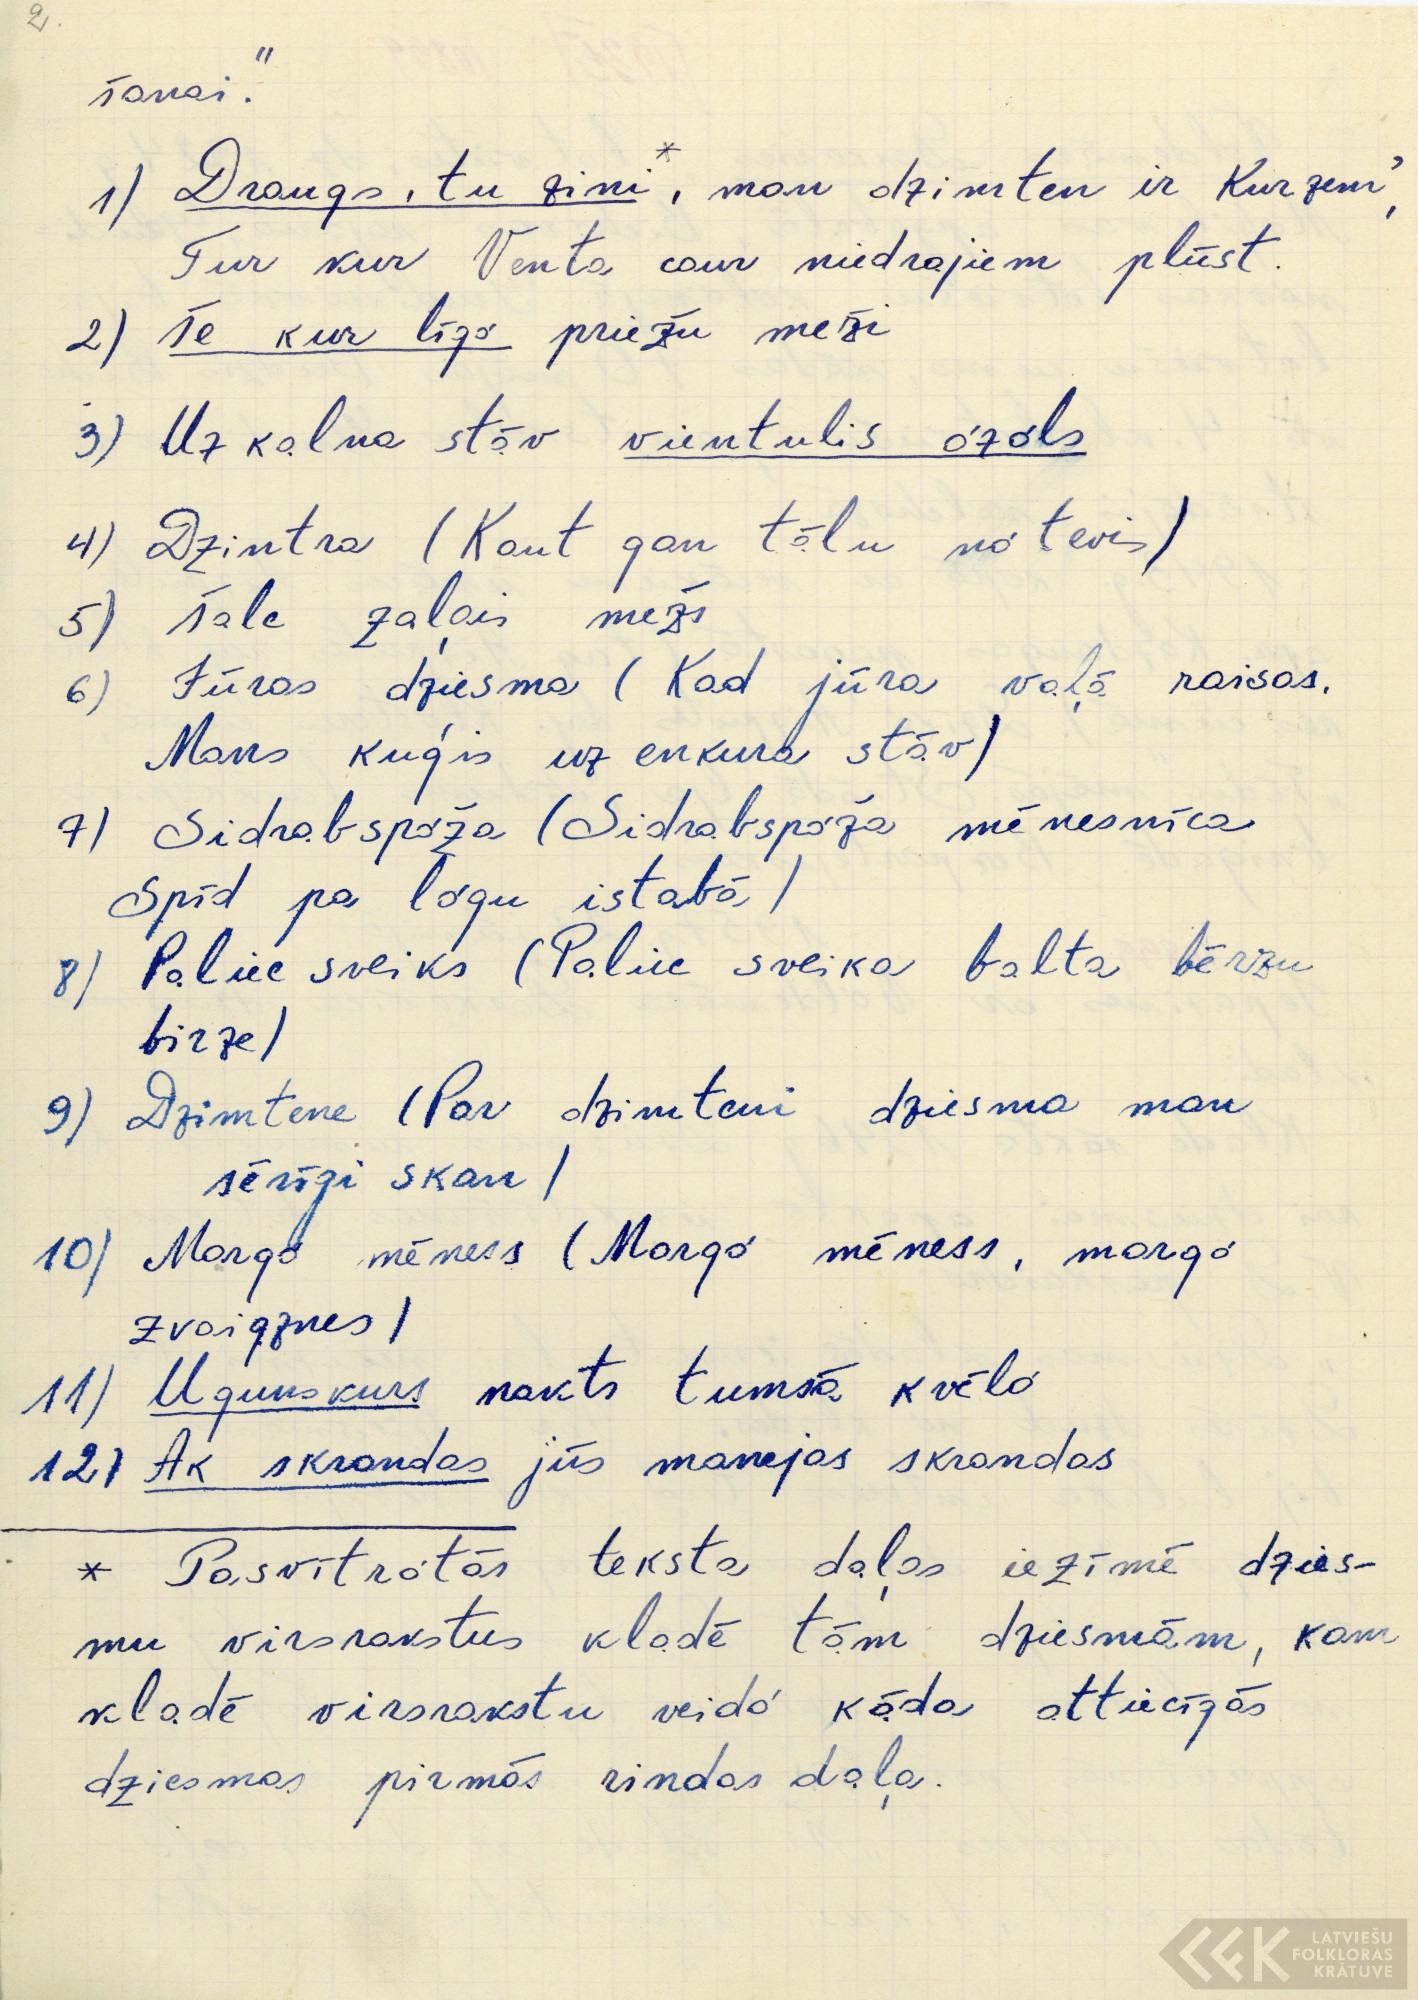 1935-ekspedicija-Kuldiga-un-Aizpute-18-0088